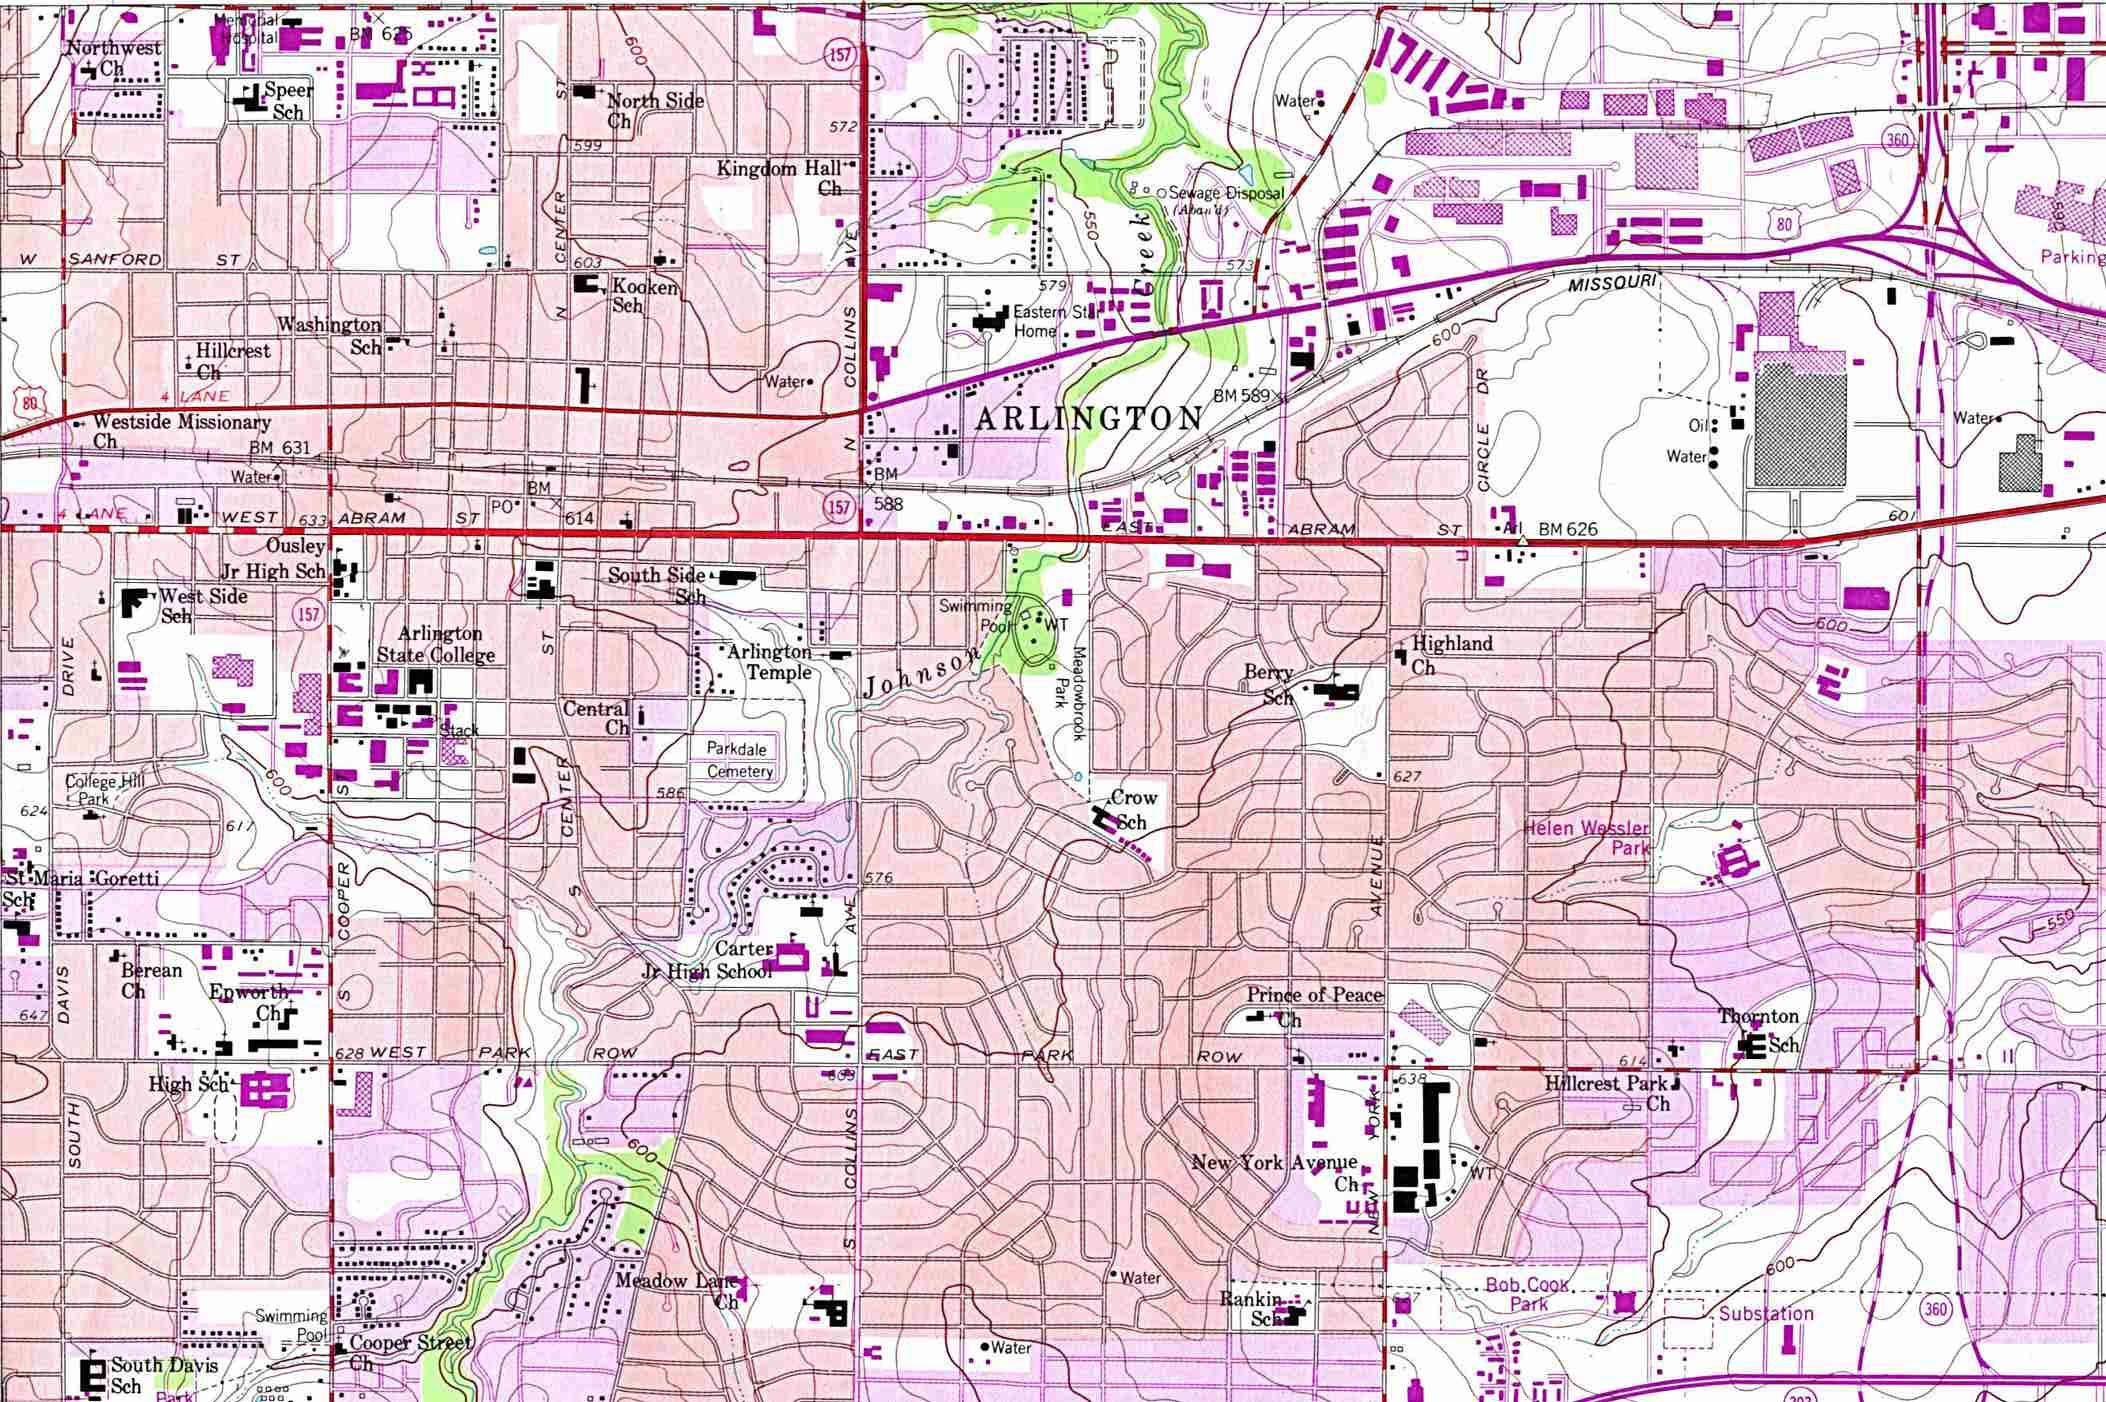 Texas City Maps - Perry-Castañeda Map Collection - Ut Library Online - Google Maps Street View Corpus Christi Texas